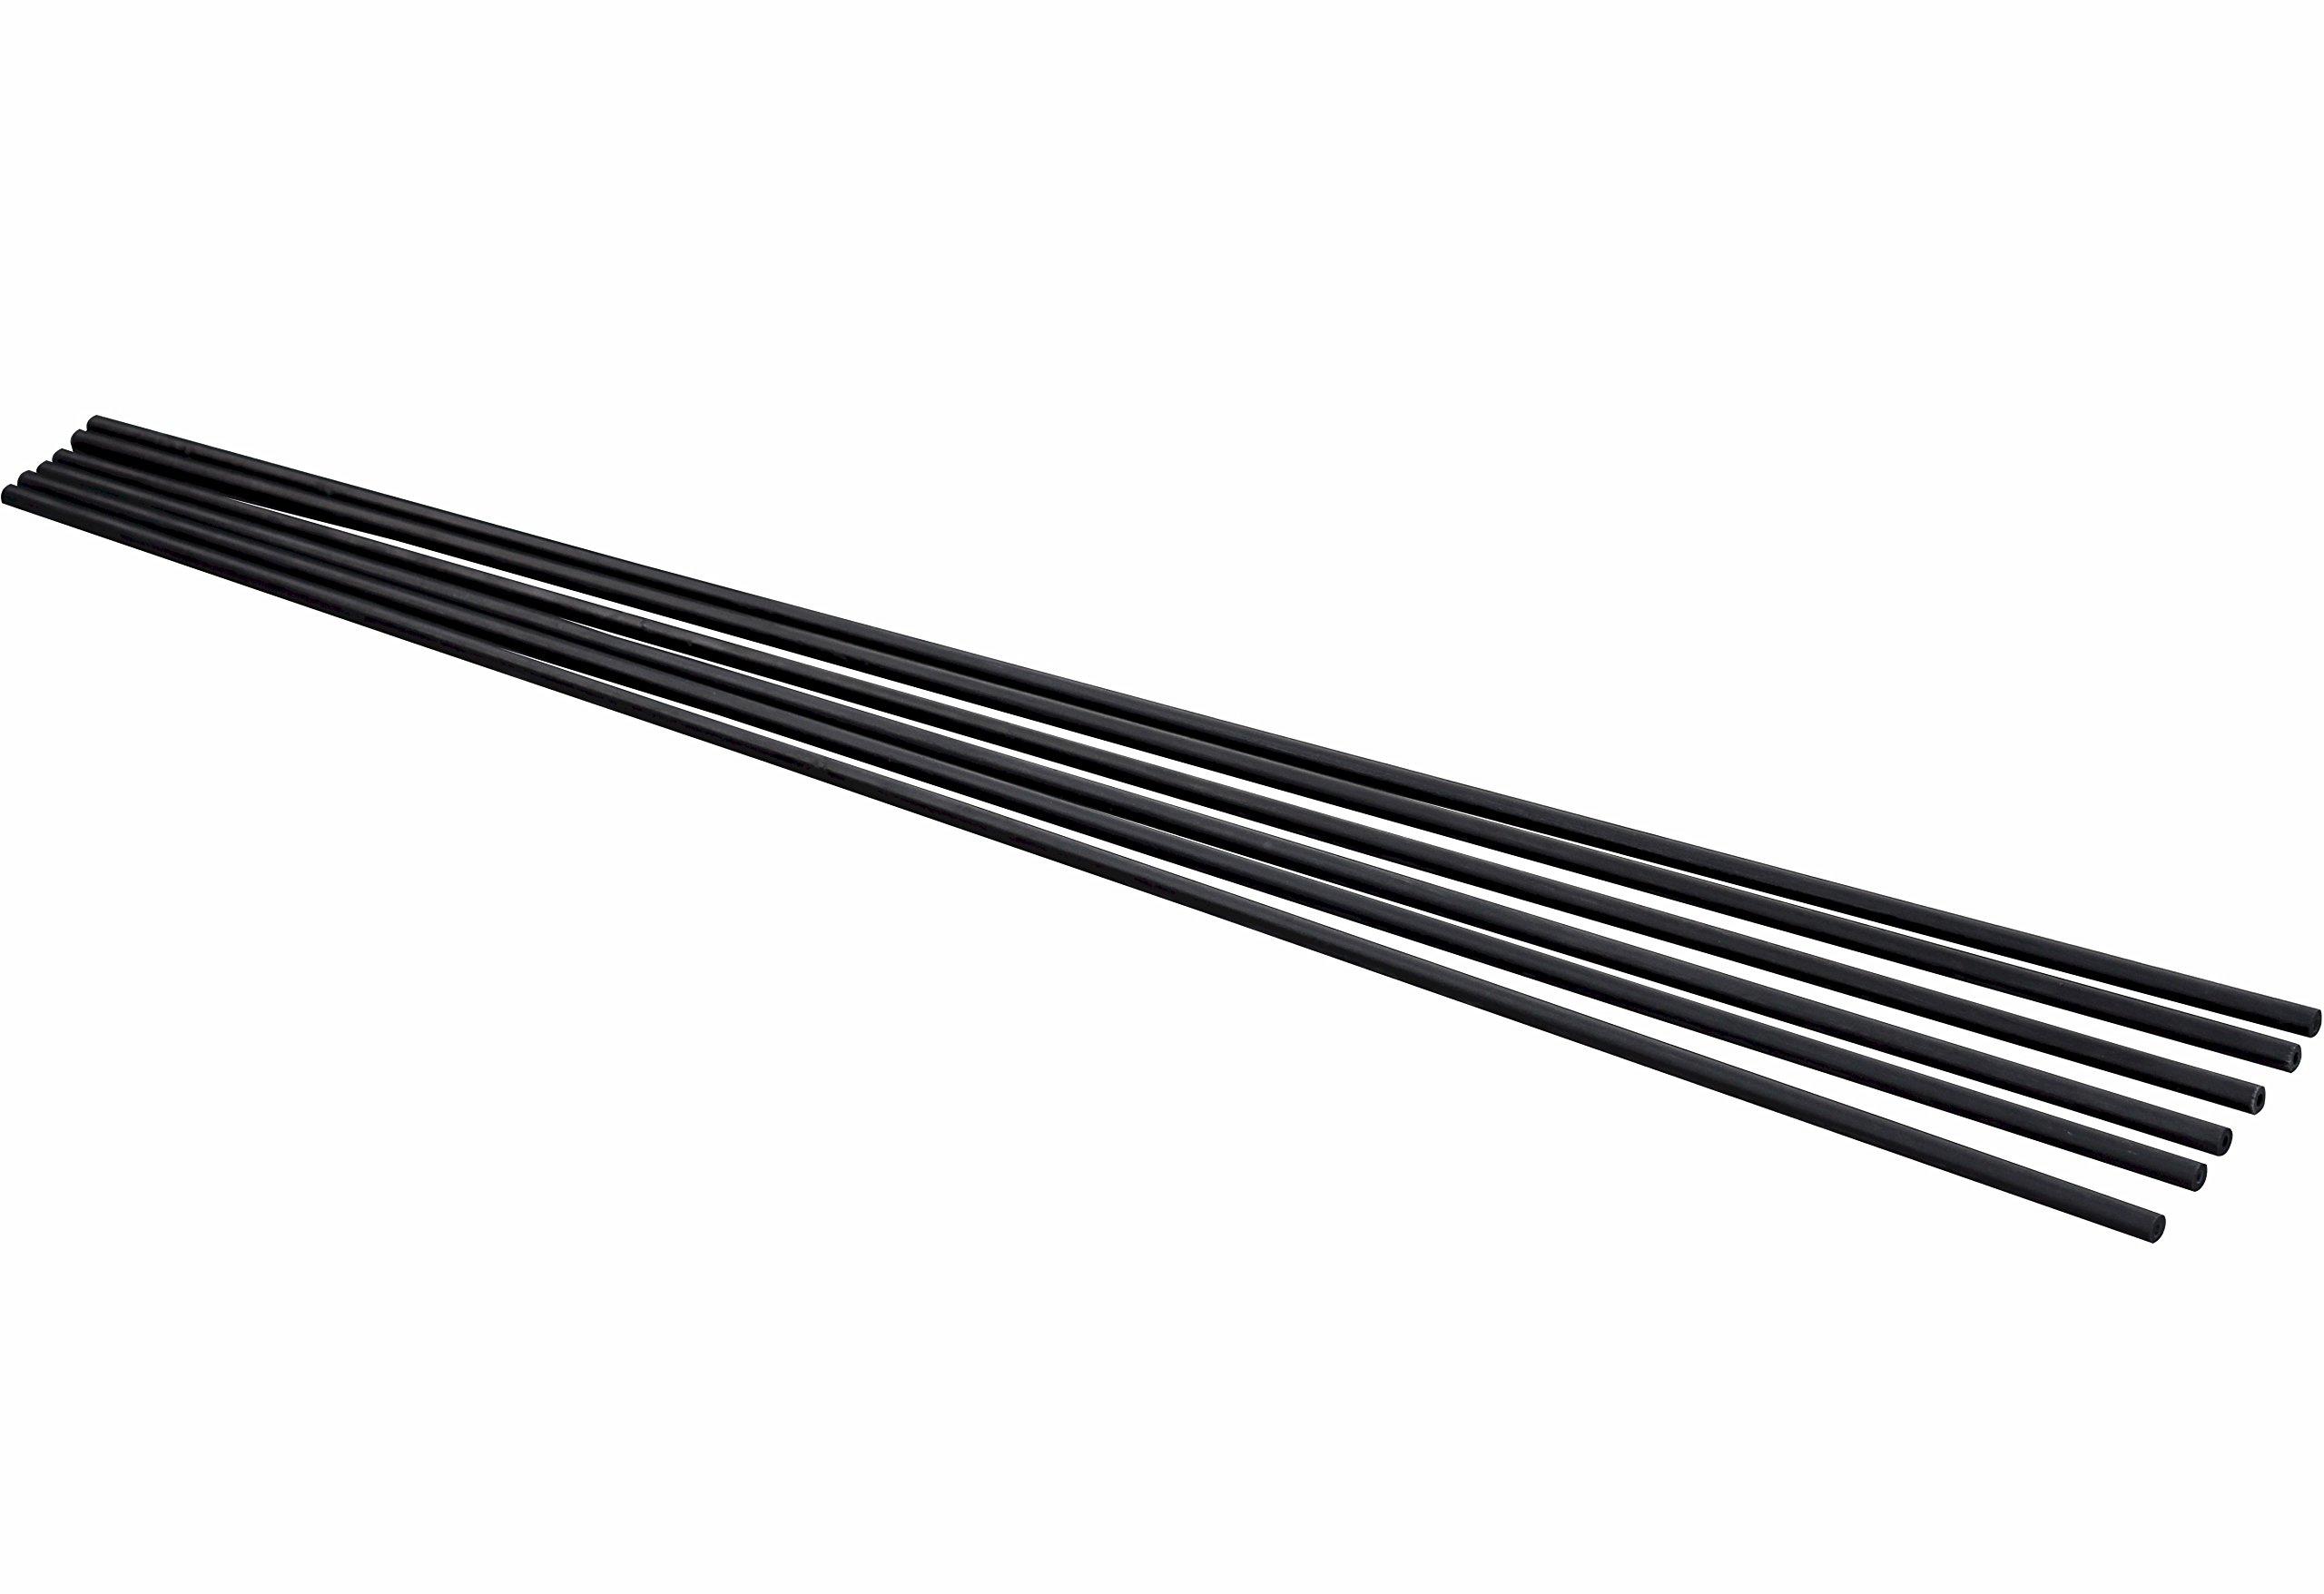 Vivere Dream Series Replacement Umbrella Rod